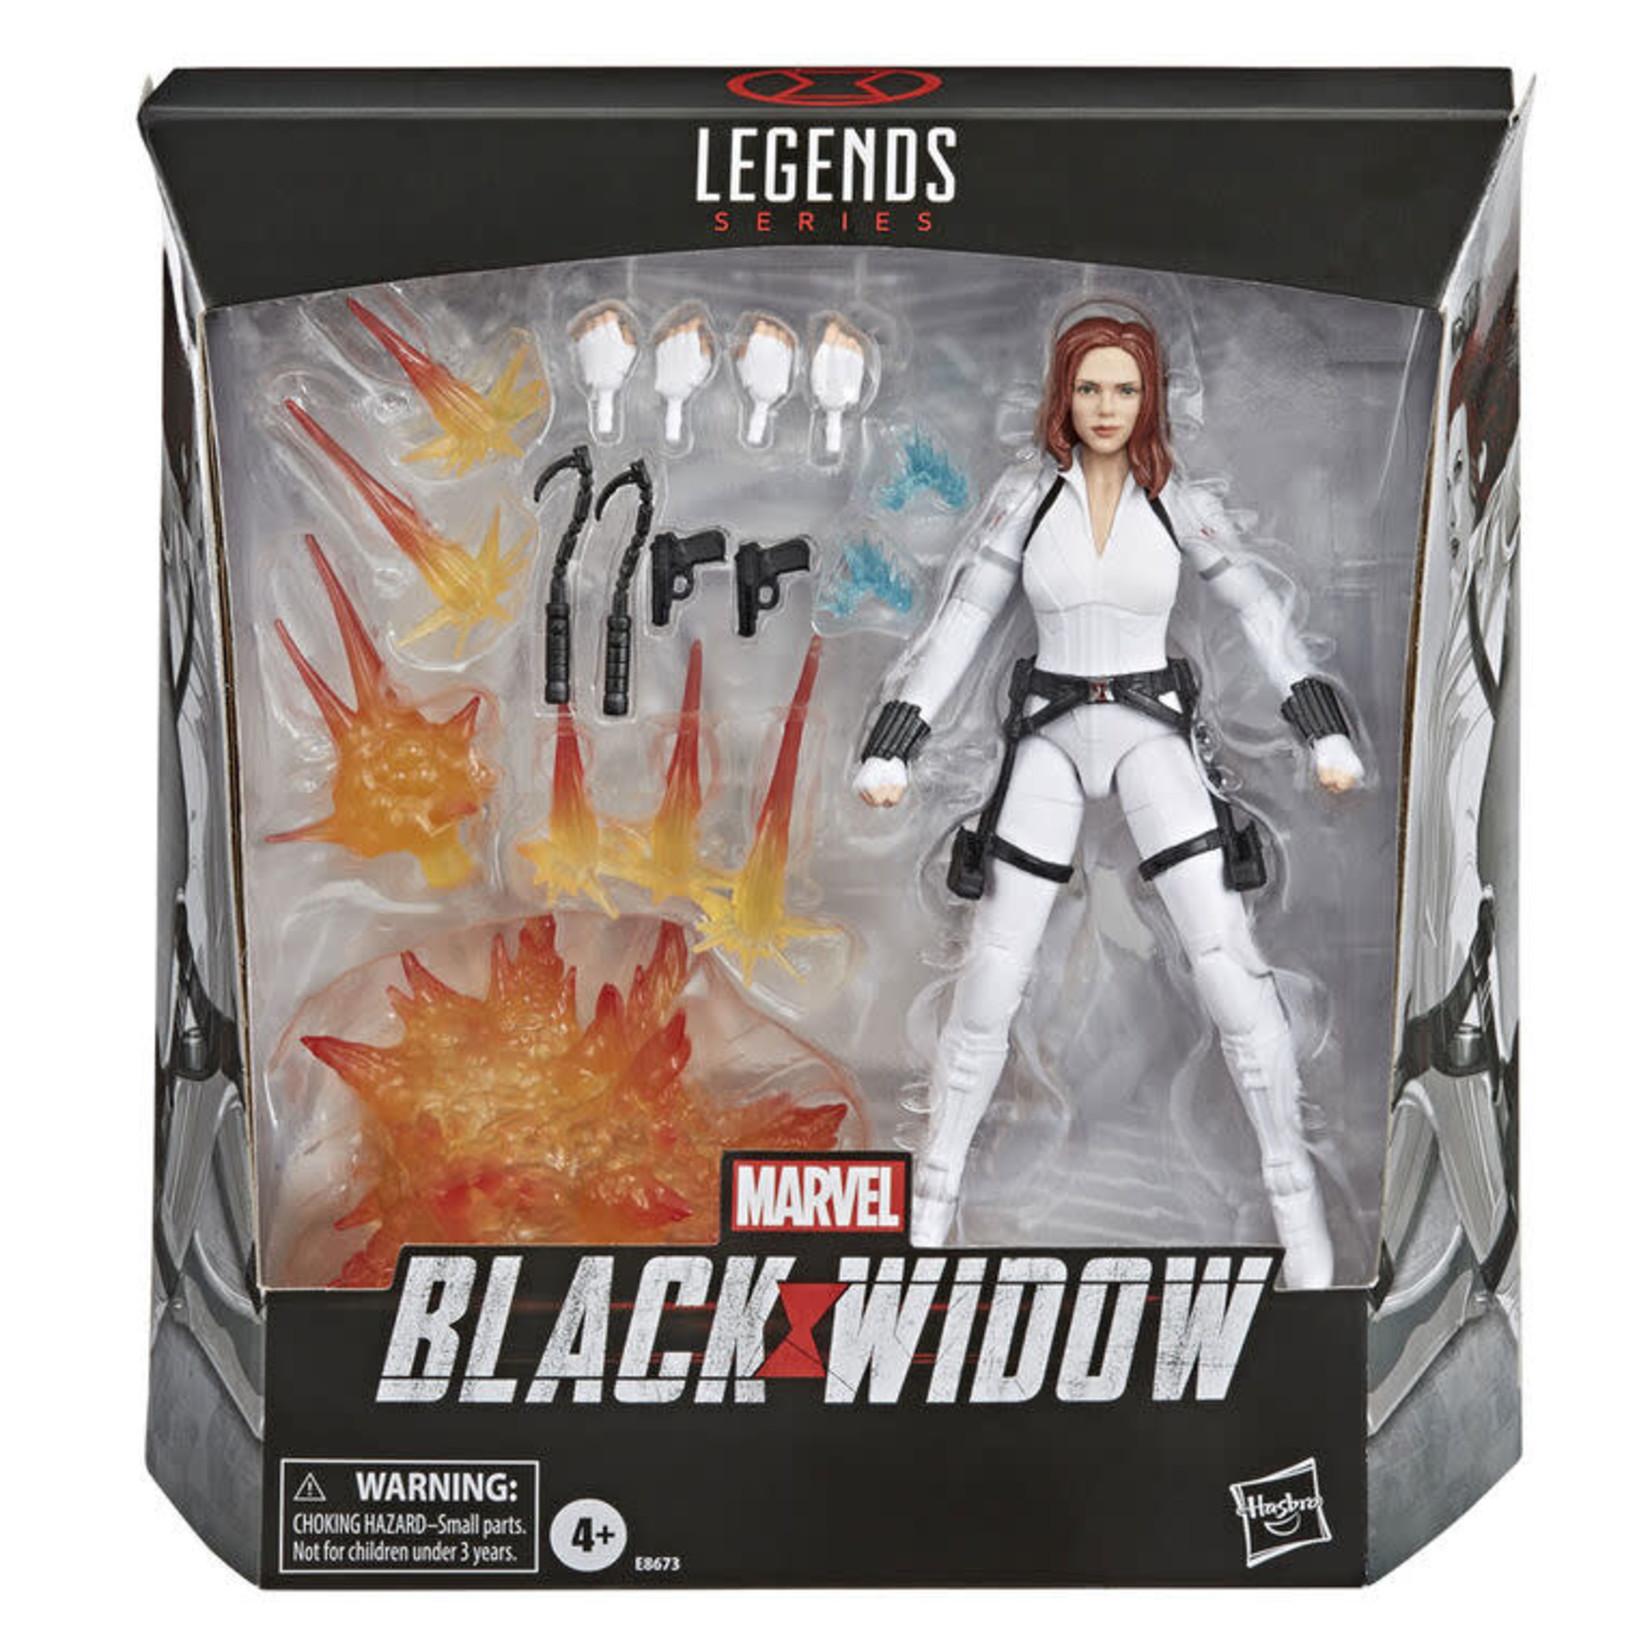 Hasbro Marvel Black Widow Legends Series Black Widow